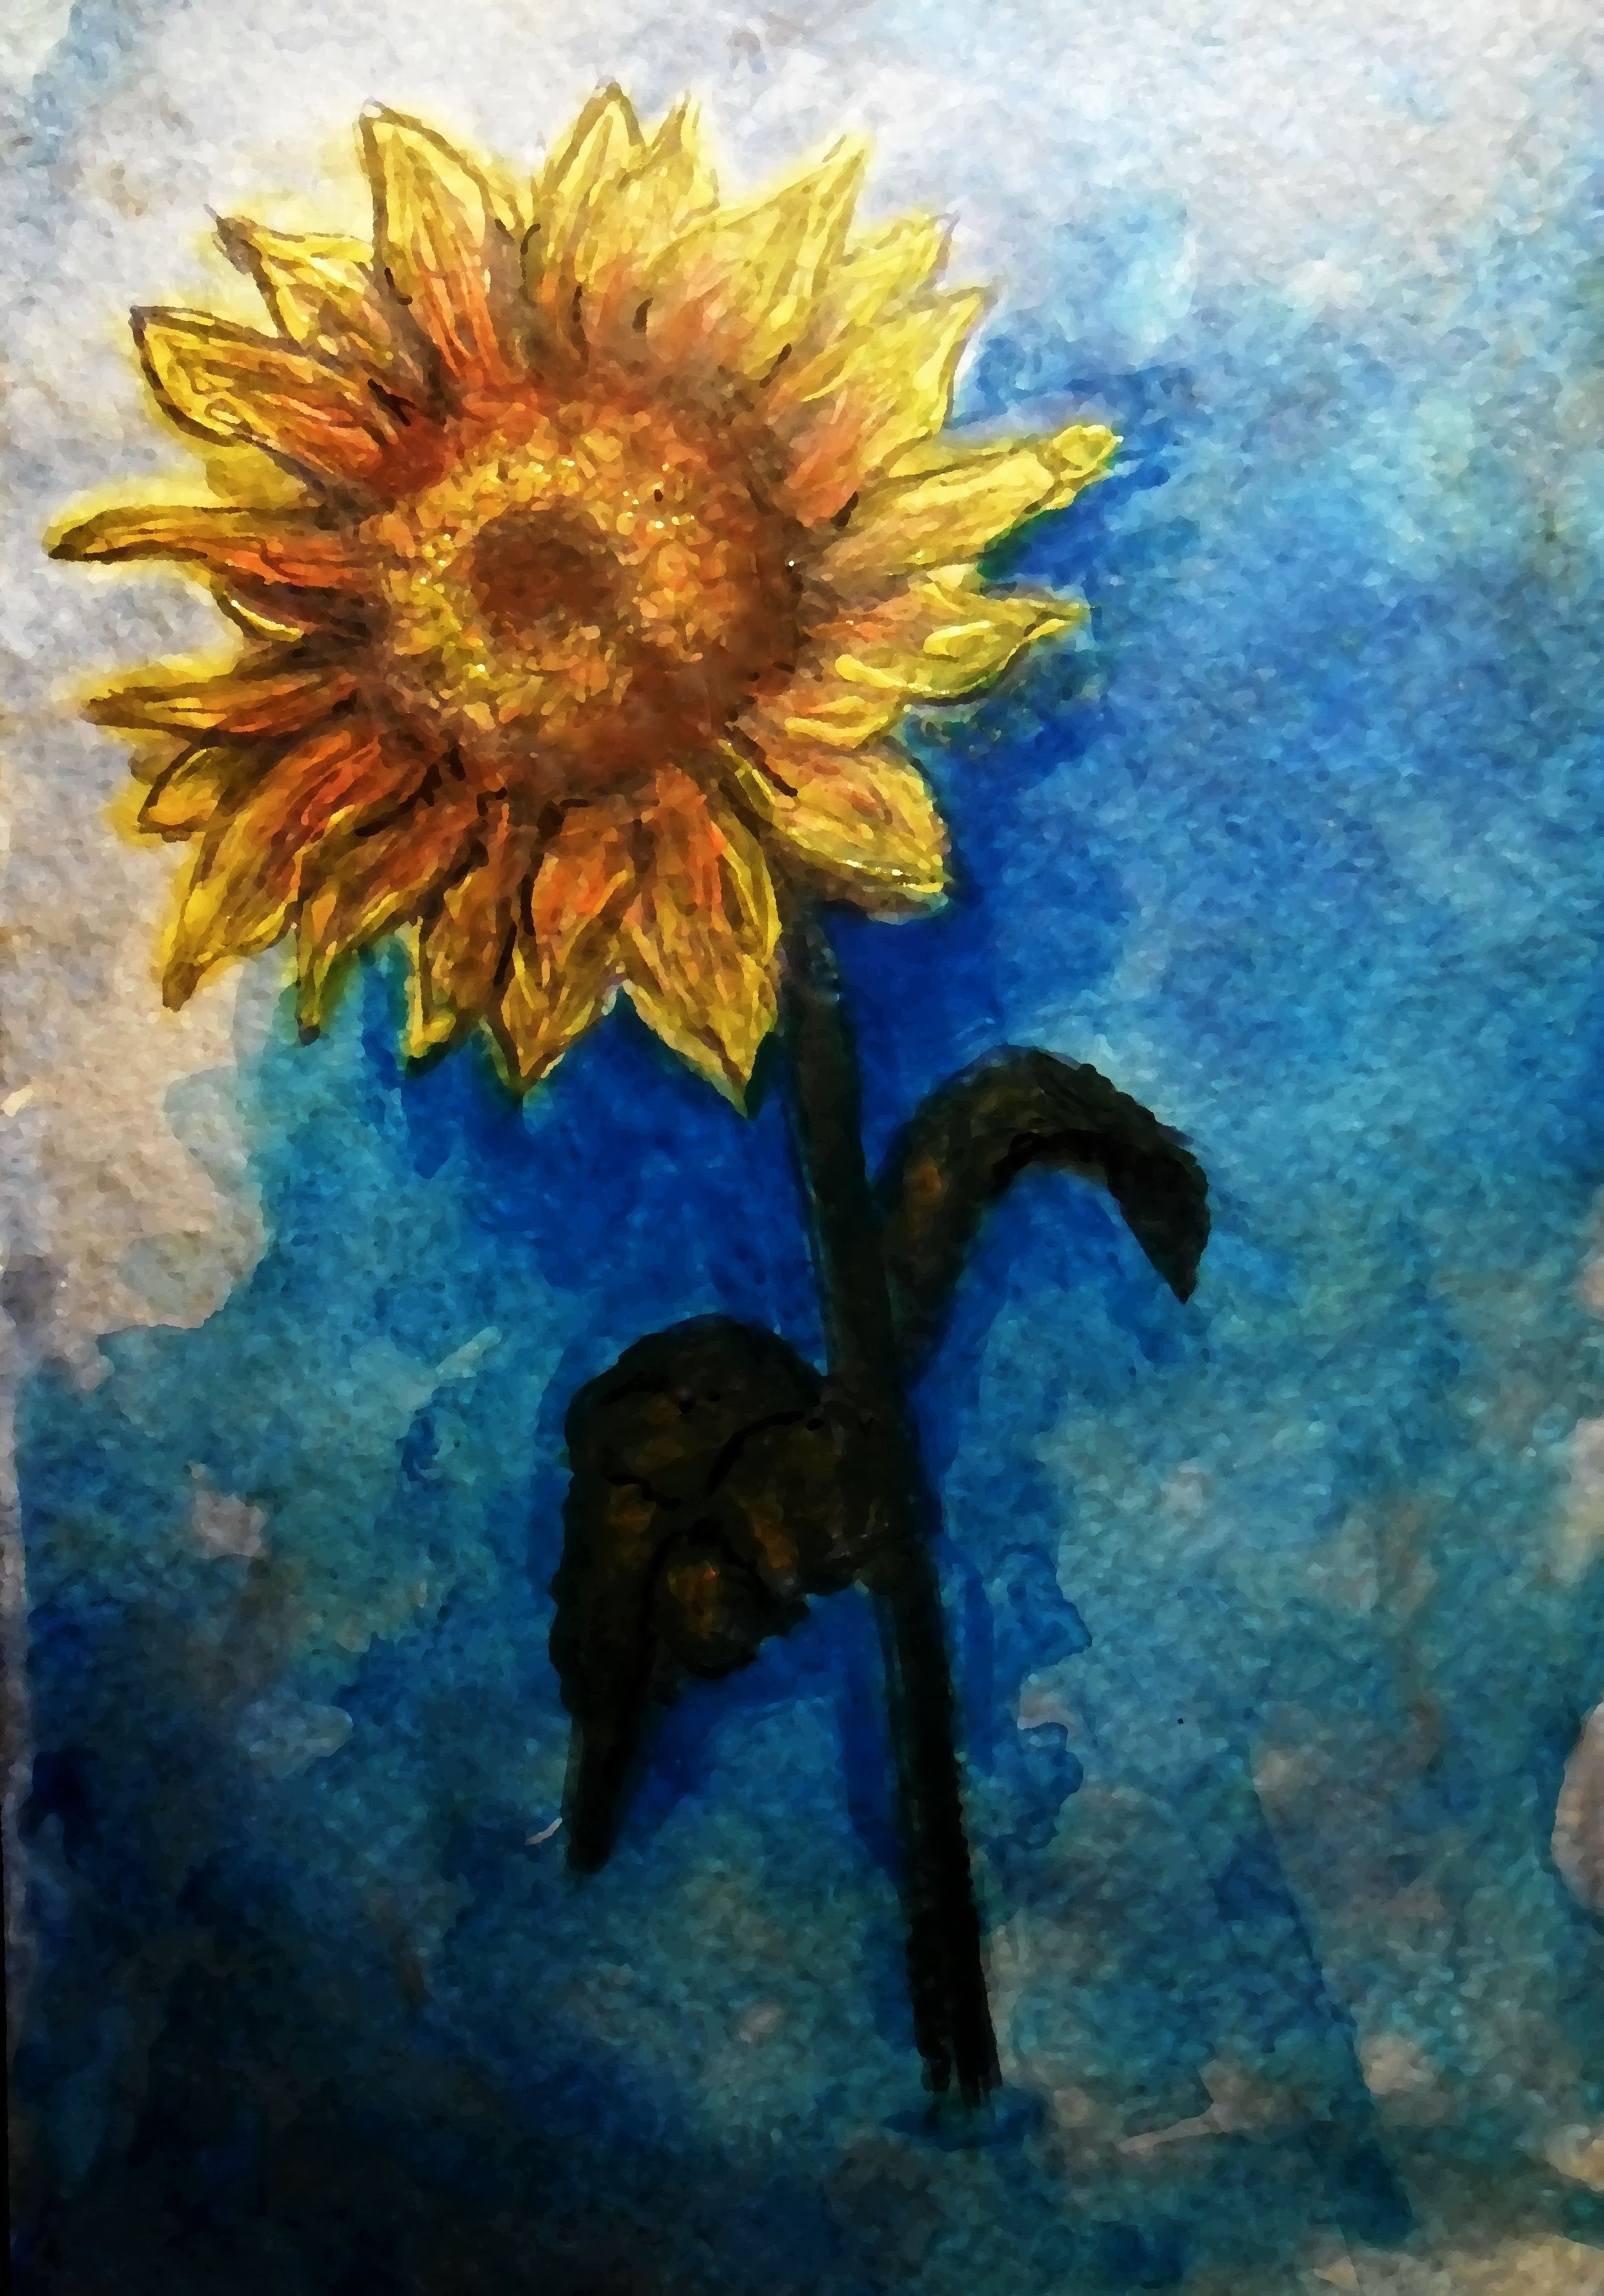 Postcards a acrylics handmade handmade paintings and drawings